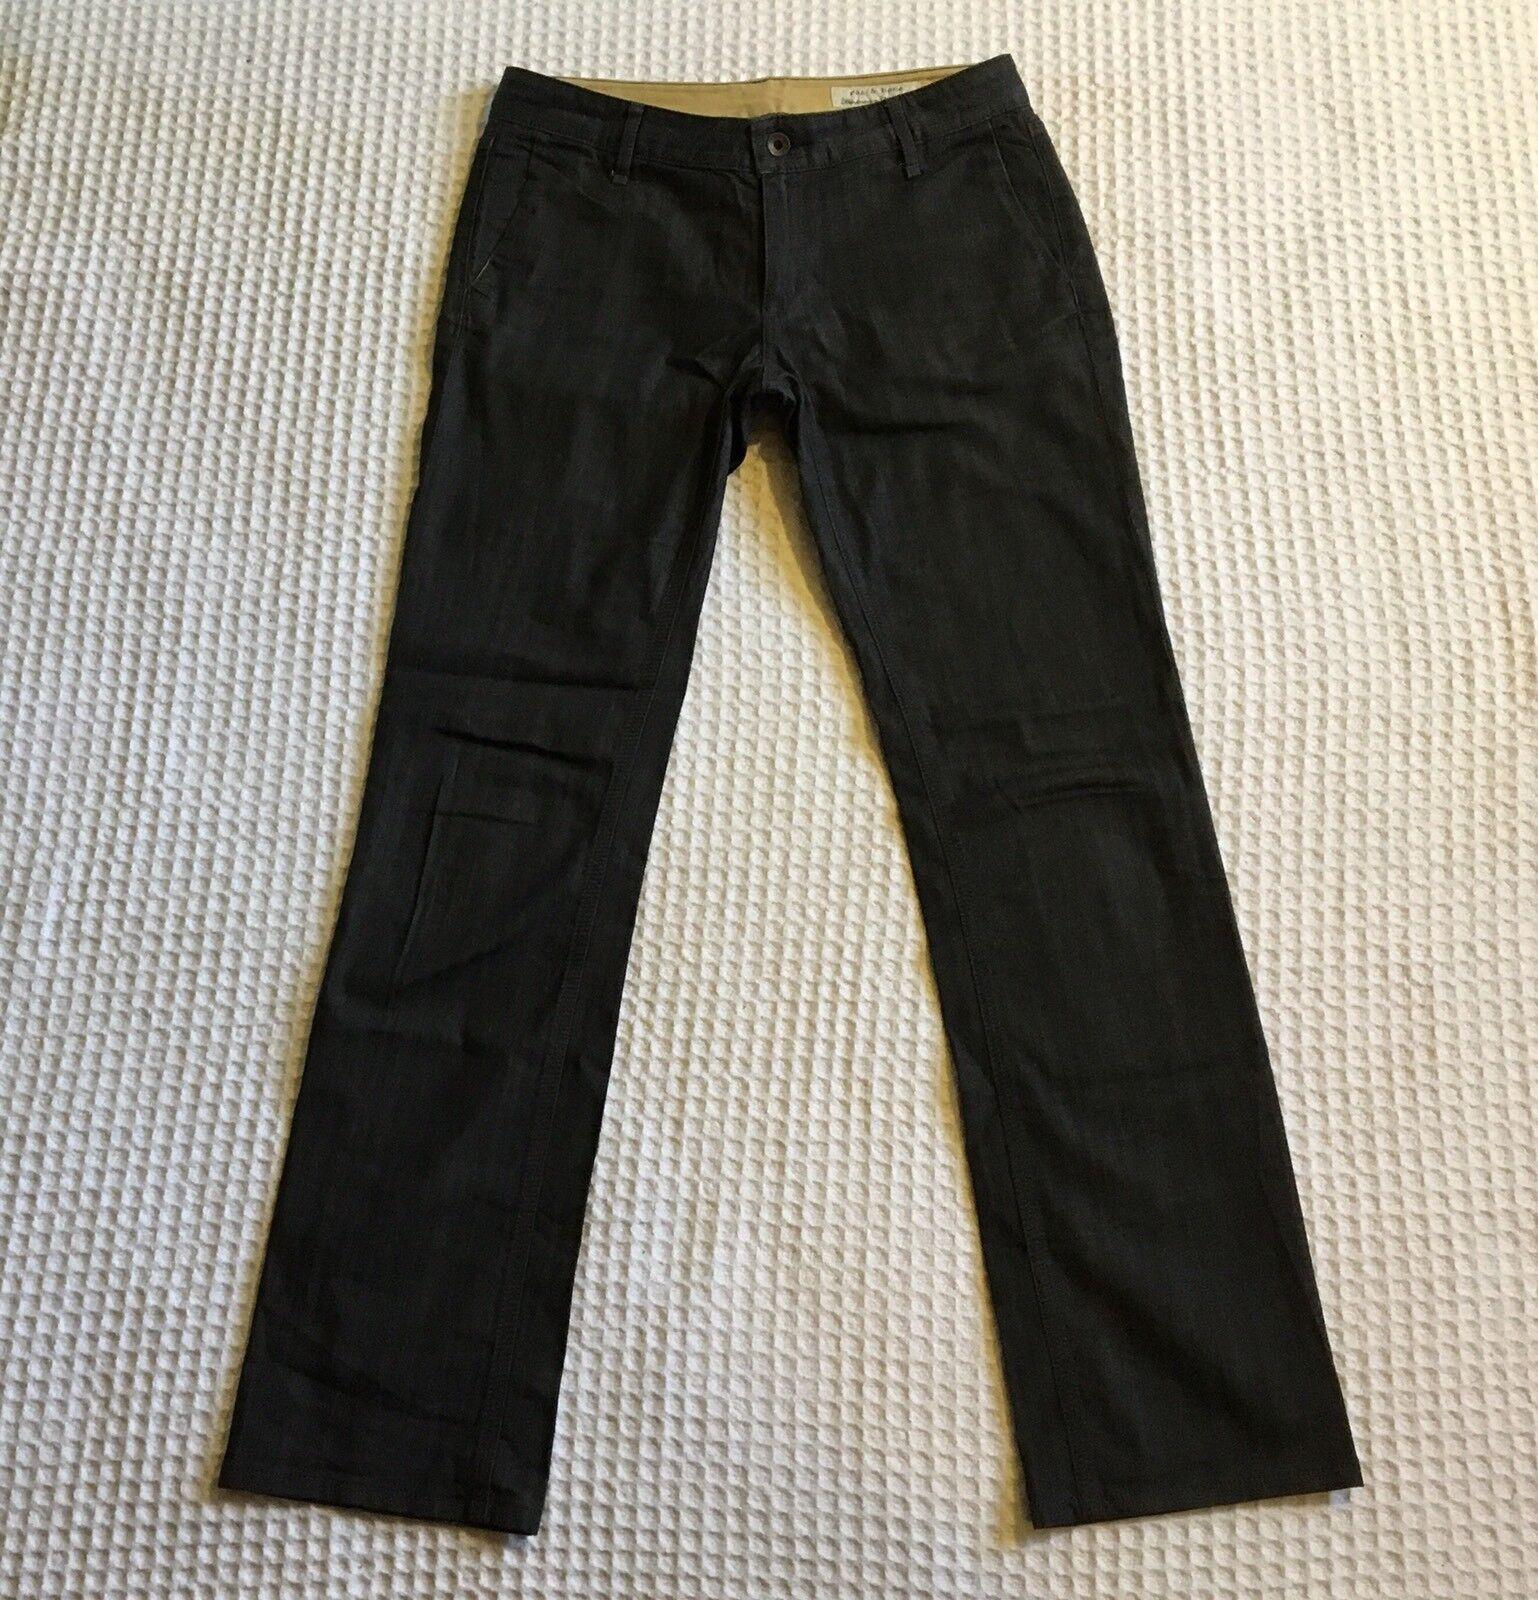 RAG & BONE RBW19 Trouser Style Jeans Trousers Pants  Indigo bluee 28